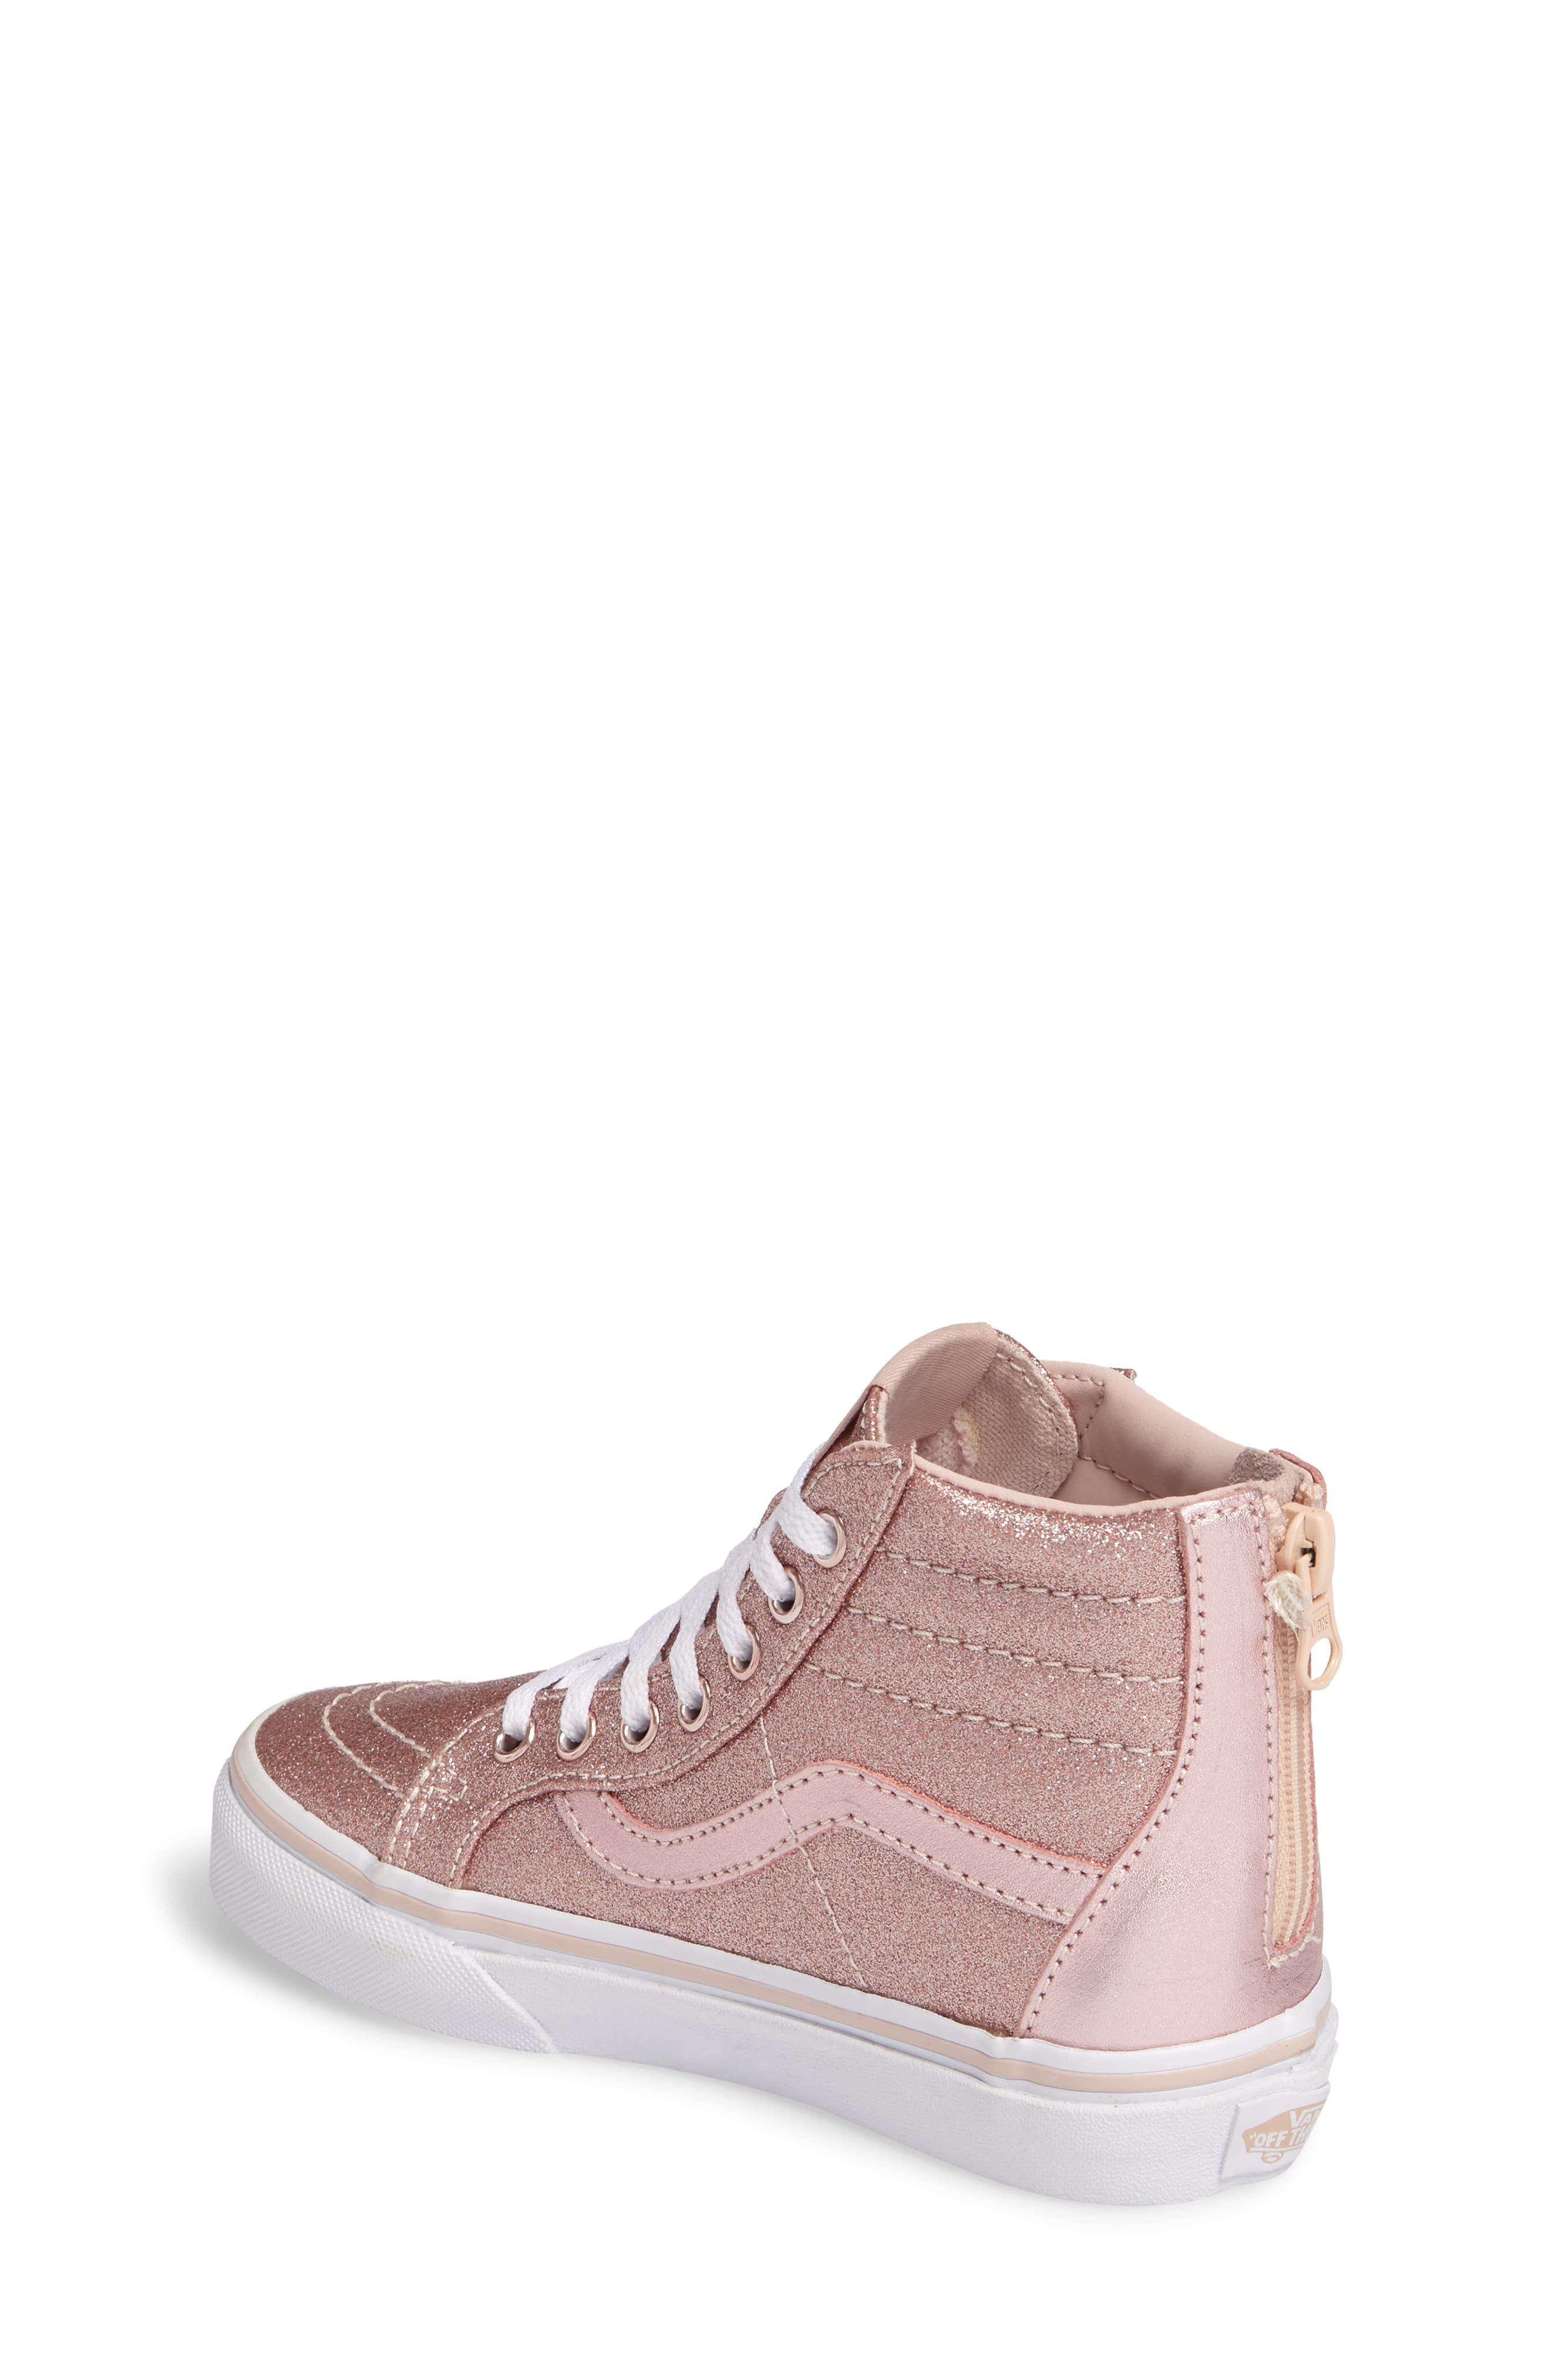 big girls u0027 shoes sizes 3 5 7 nordstrom